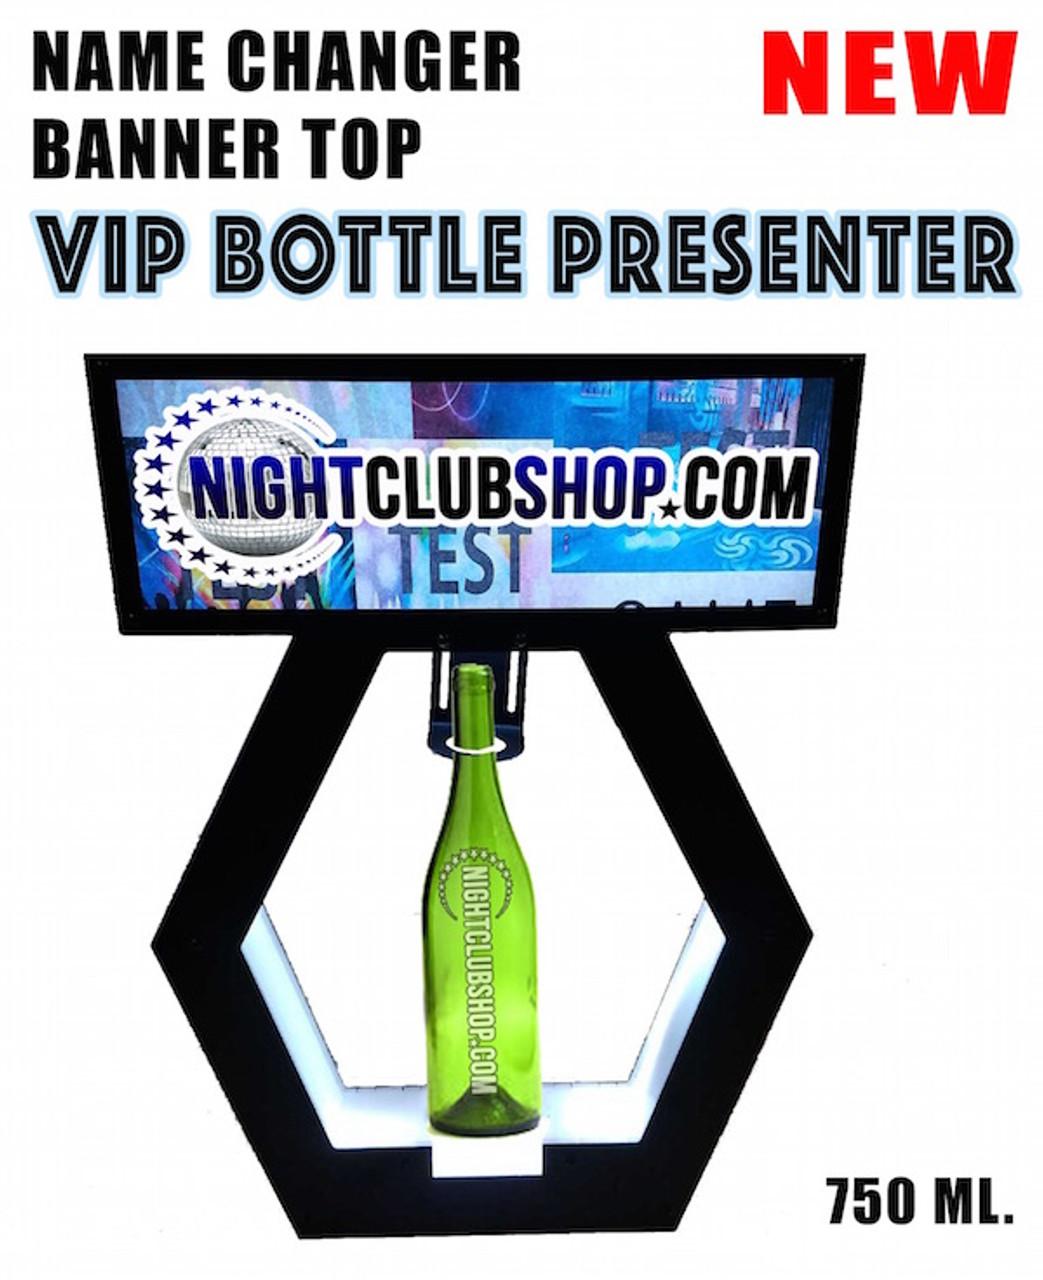 "UNIVERSAL,Champagne,Liquor, Carrier, Caddie ""BANNER TOP"", PRESENTER, NAME CHANGER,Bottle delivery, bottle service VIP,SIGN, LED,Illuminated,Sign,Light Box,"